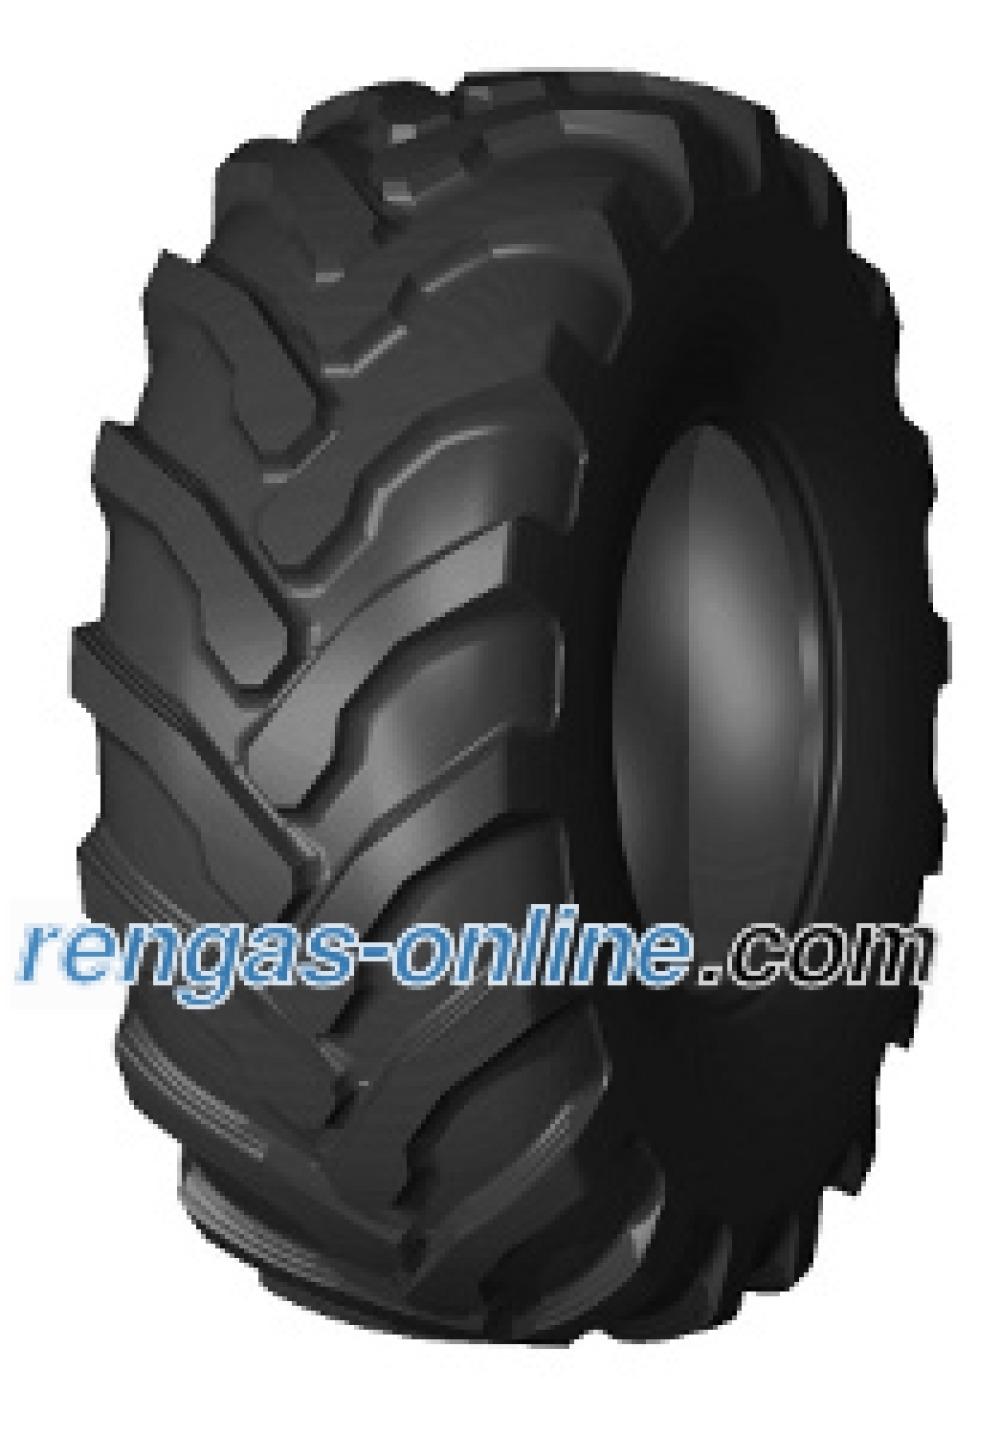 solideal-sla-r4-175-24-10pr-tl-kaksoistunnus-46070-24